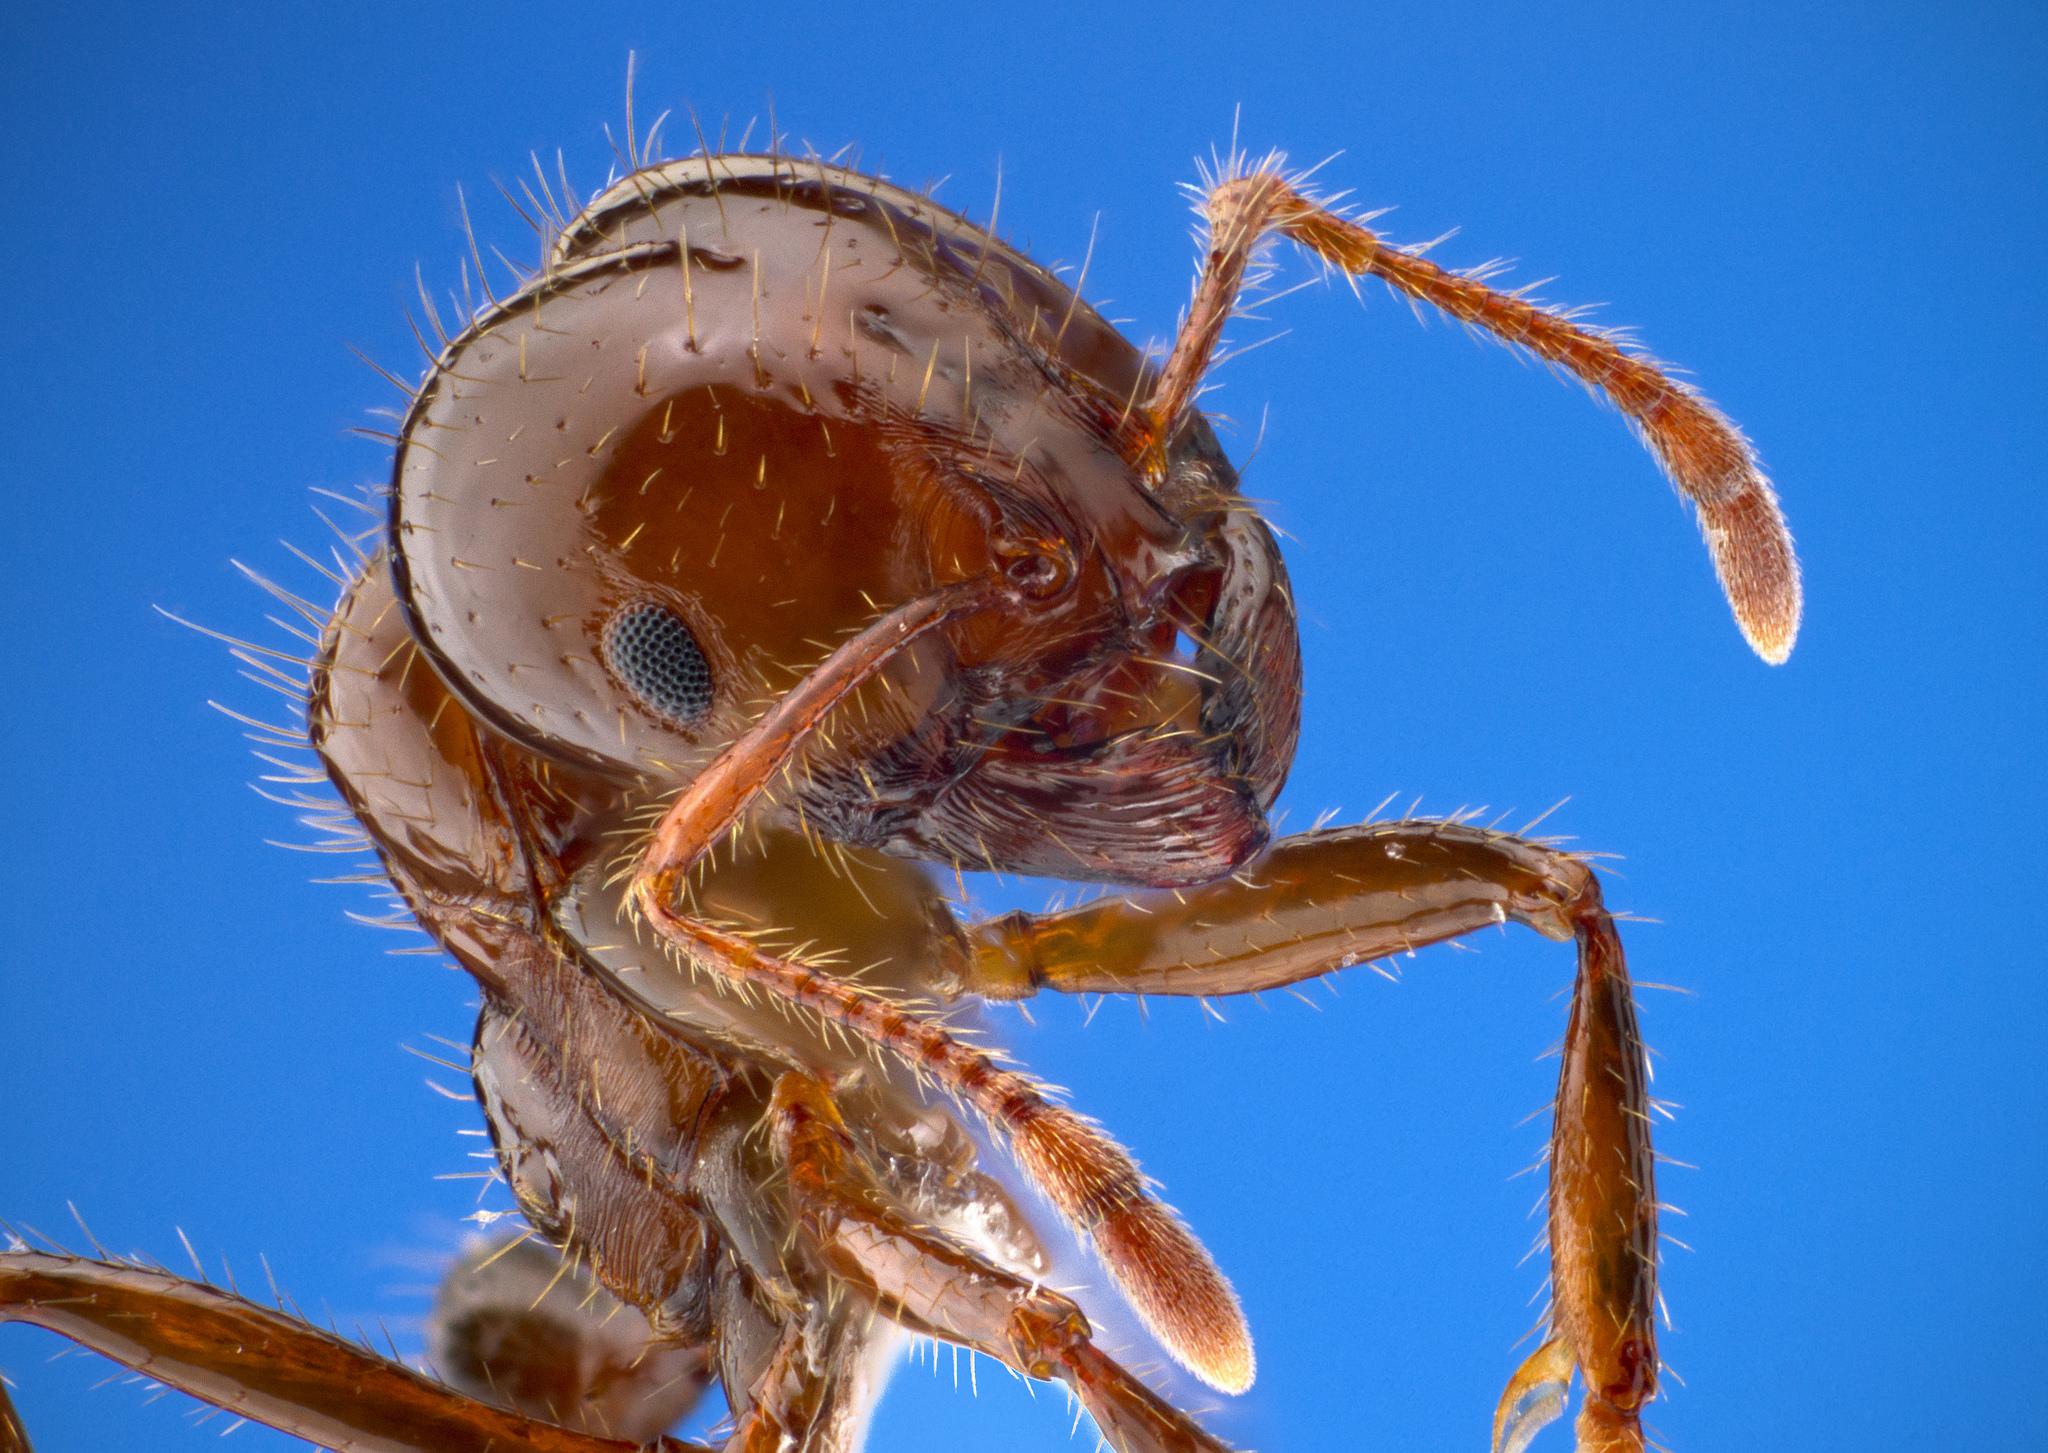 Fire Ants, Crazy Ants & Zombie Ants